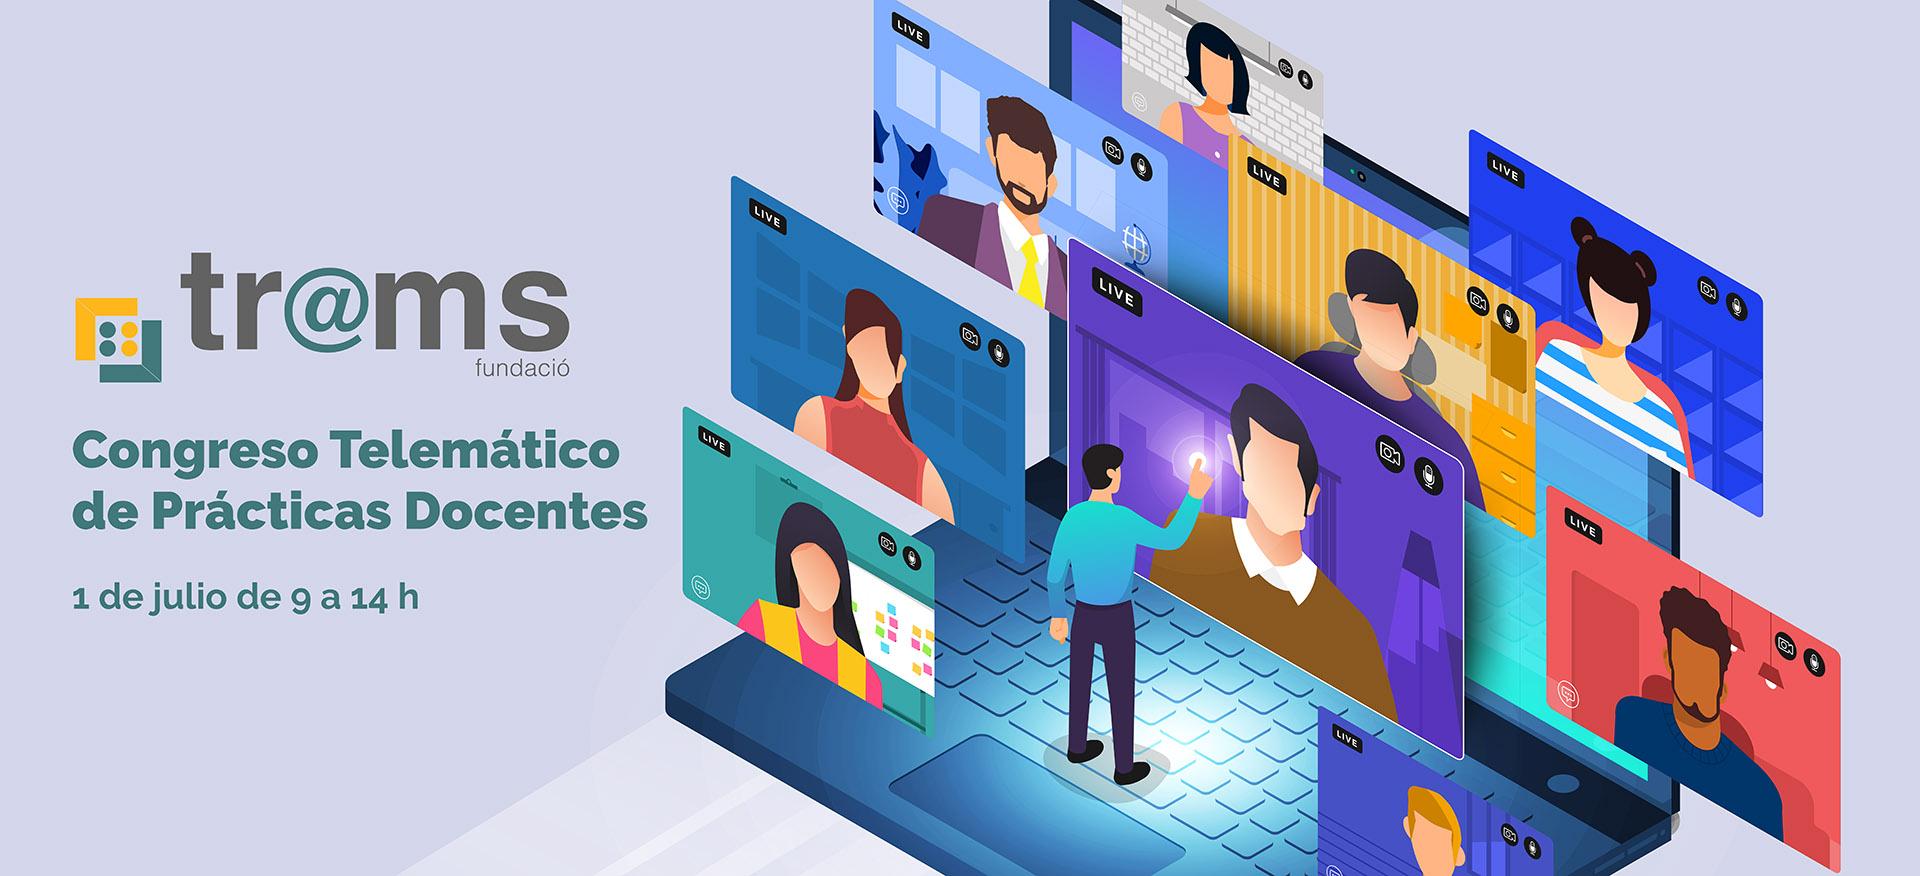 Fundació Tr@ms - Congreso Telemático de Prácticas Docentes